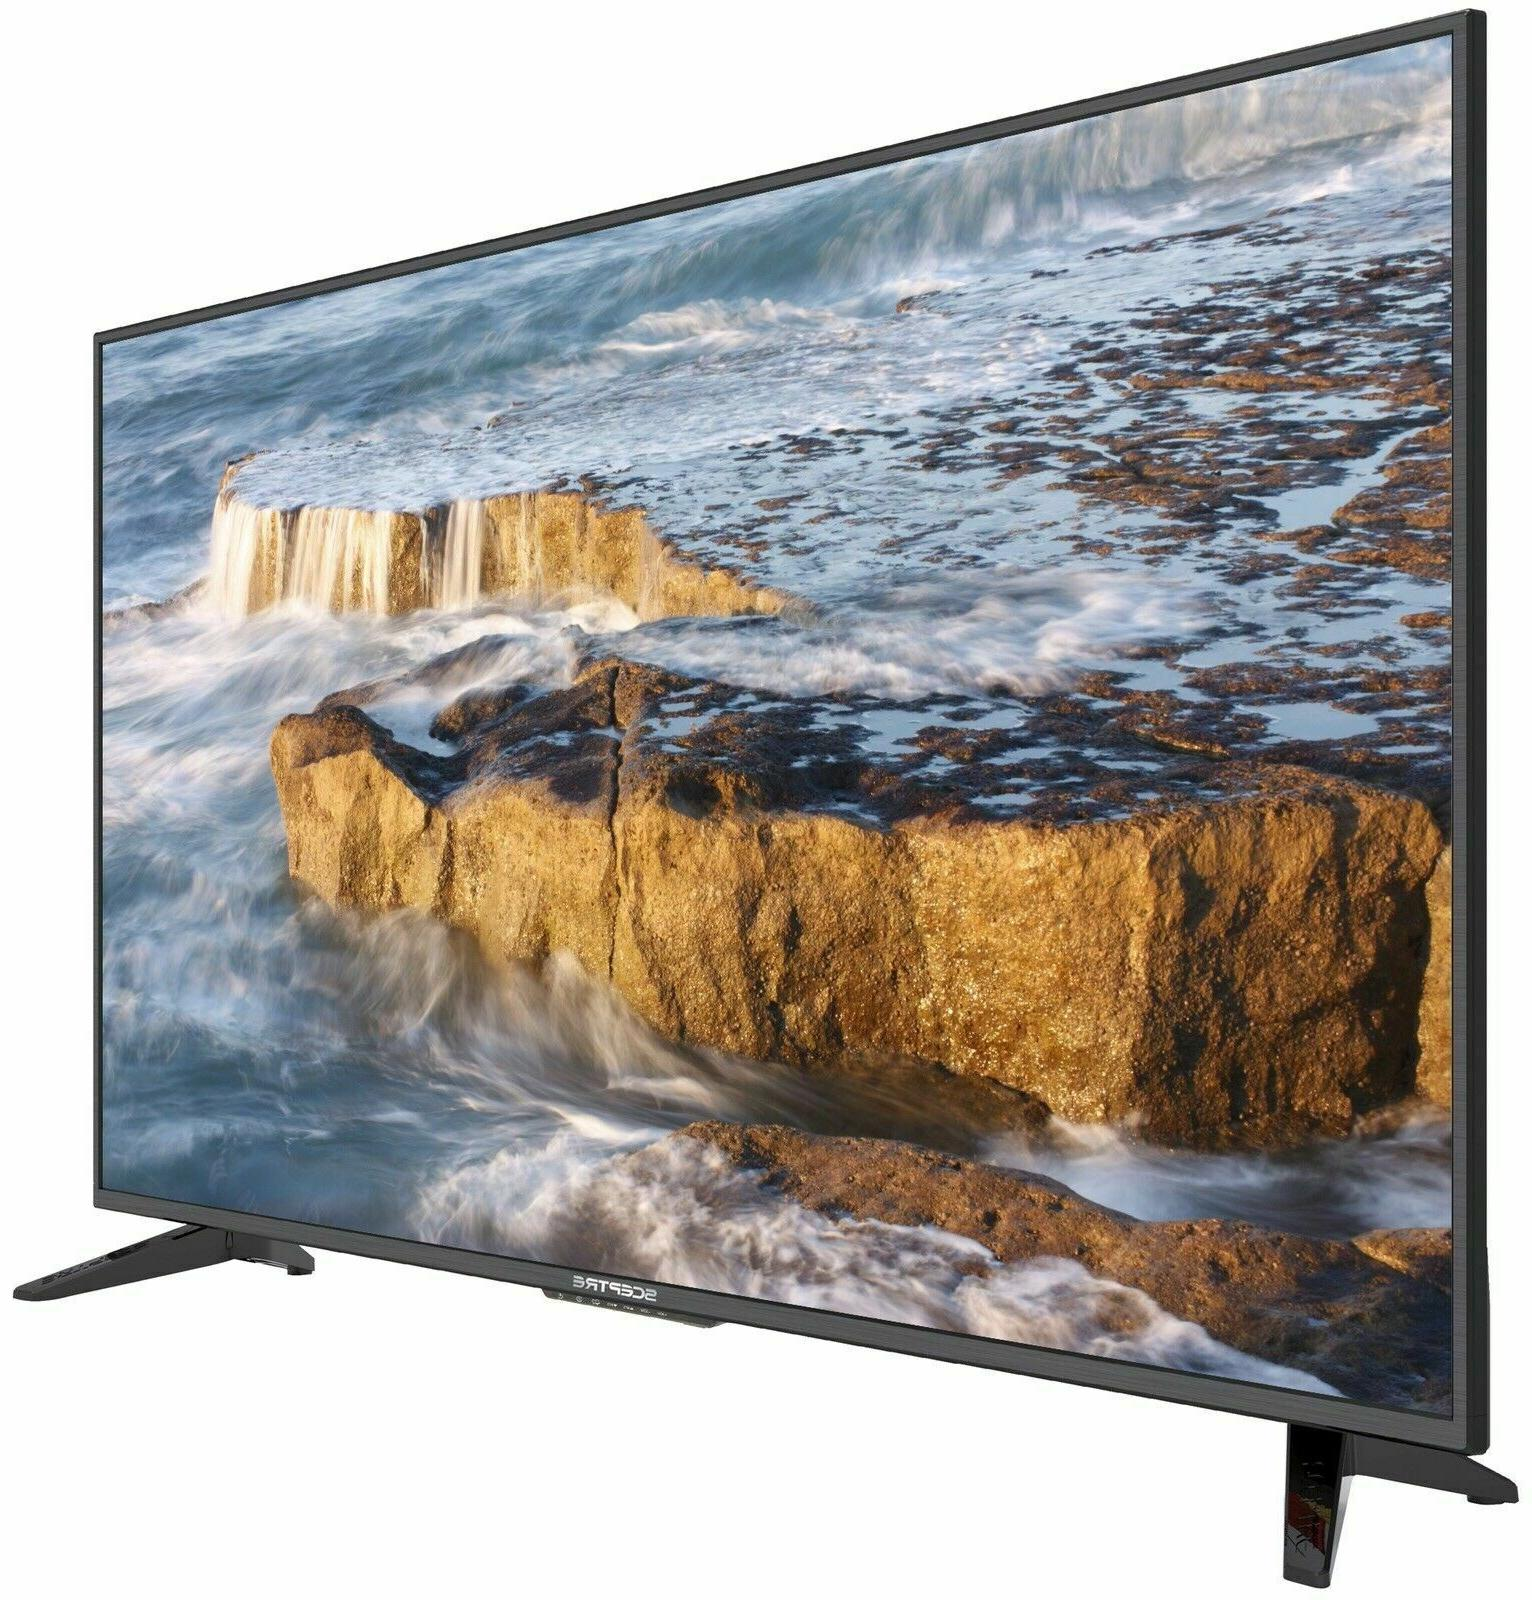 "Sceptre 50"" Class 4K UHD TV"